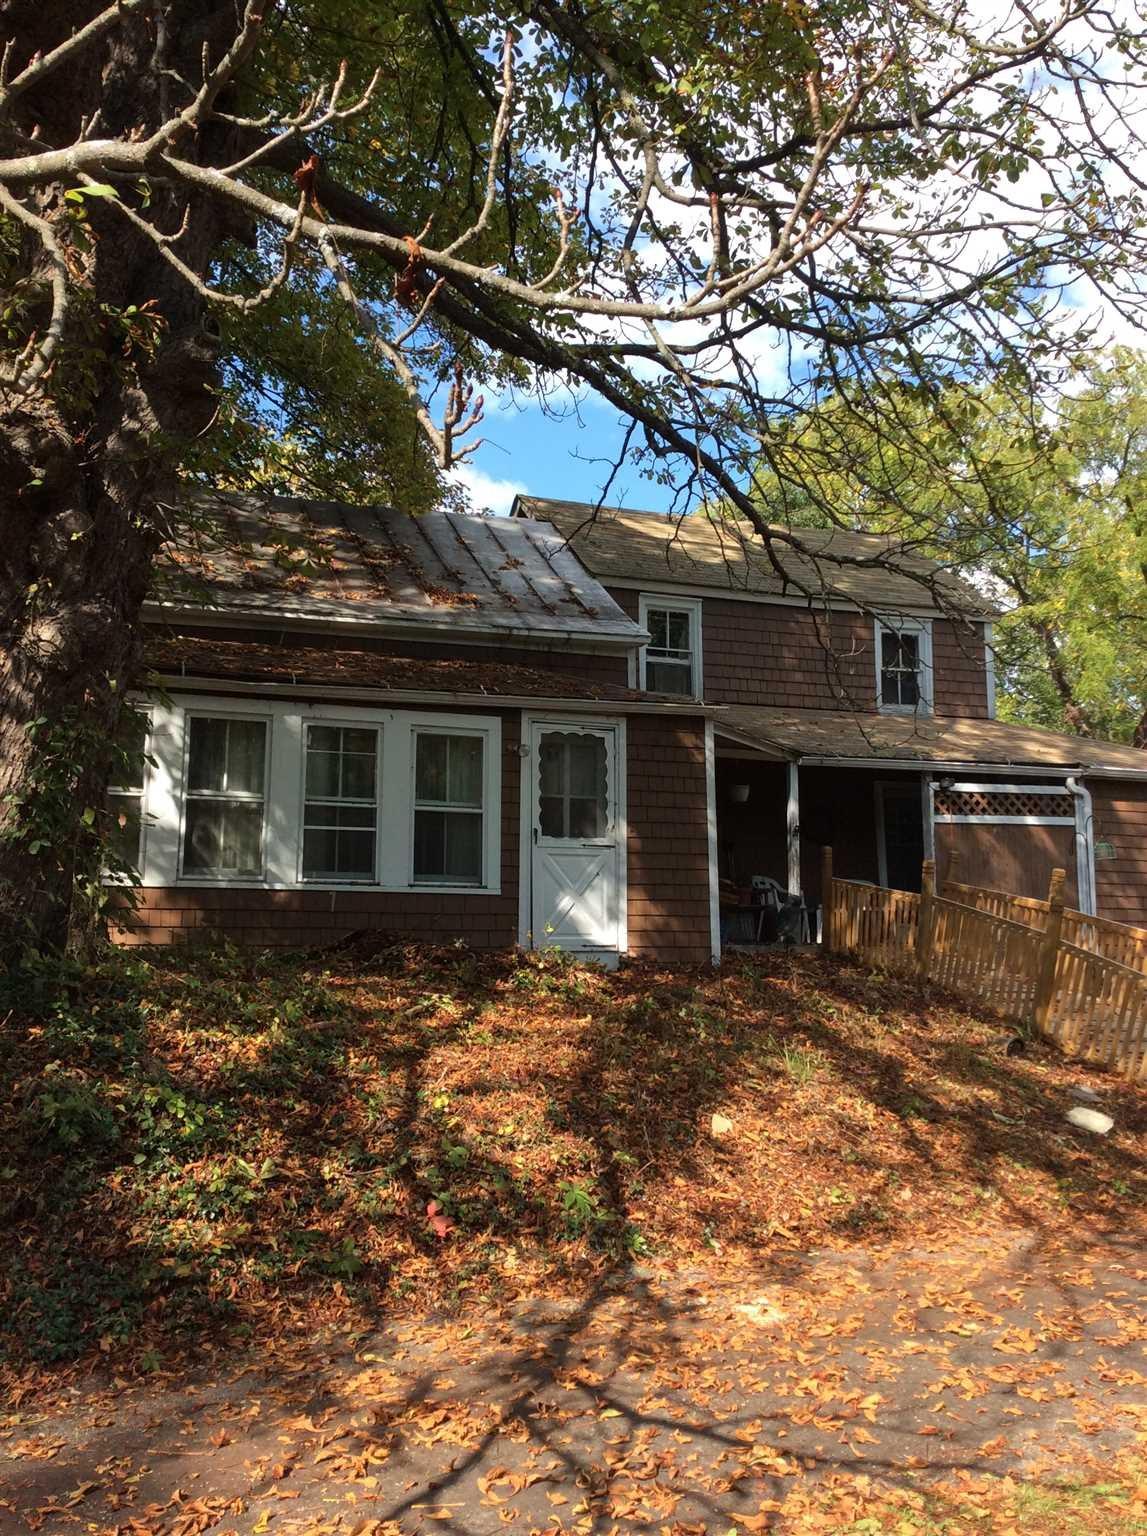 Land for Sale at 157 CREAM Street 157 CREAM Street Hyde Park, New York 12601 United States